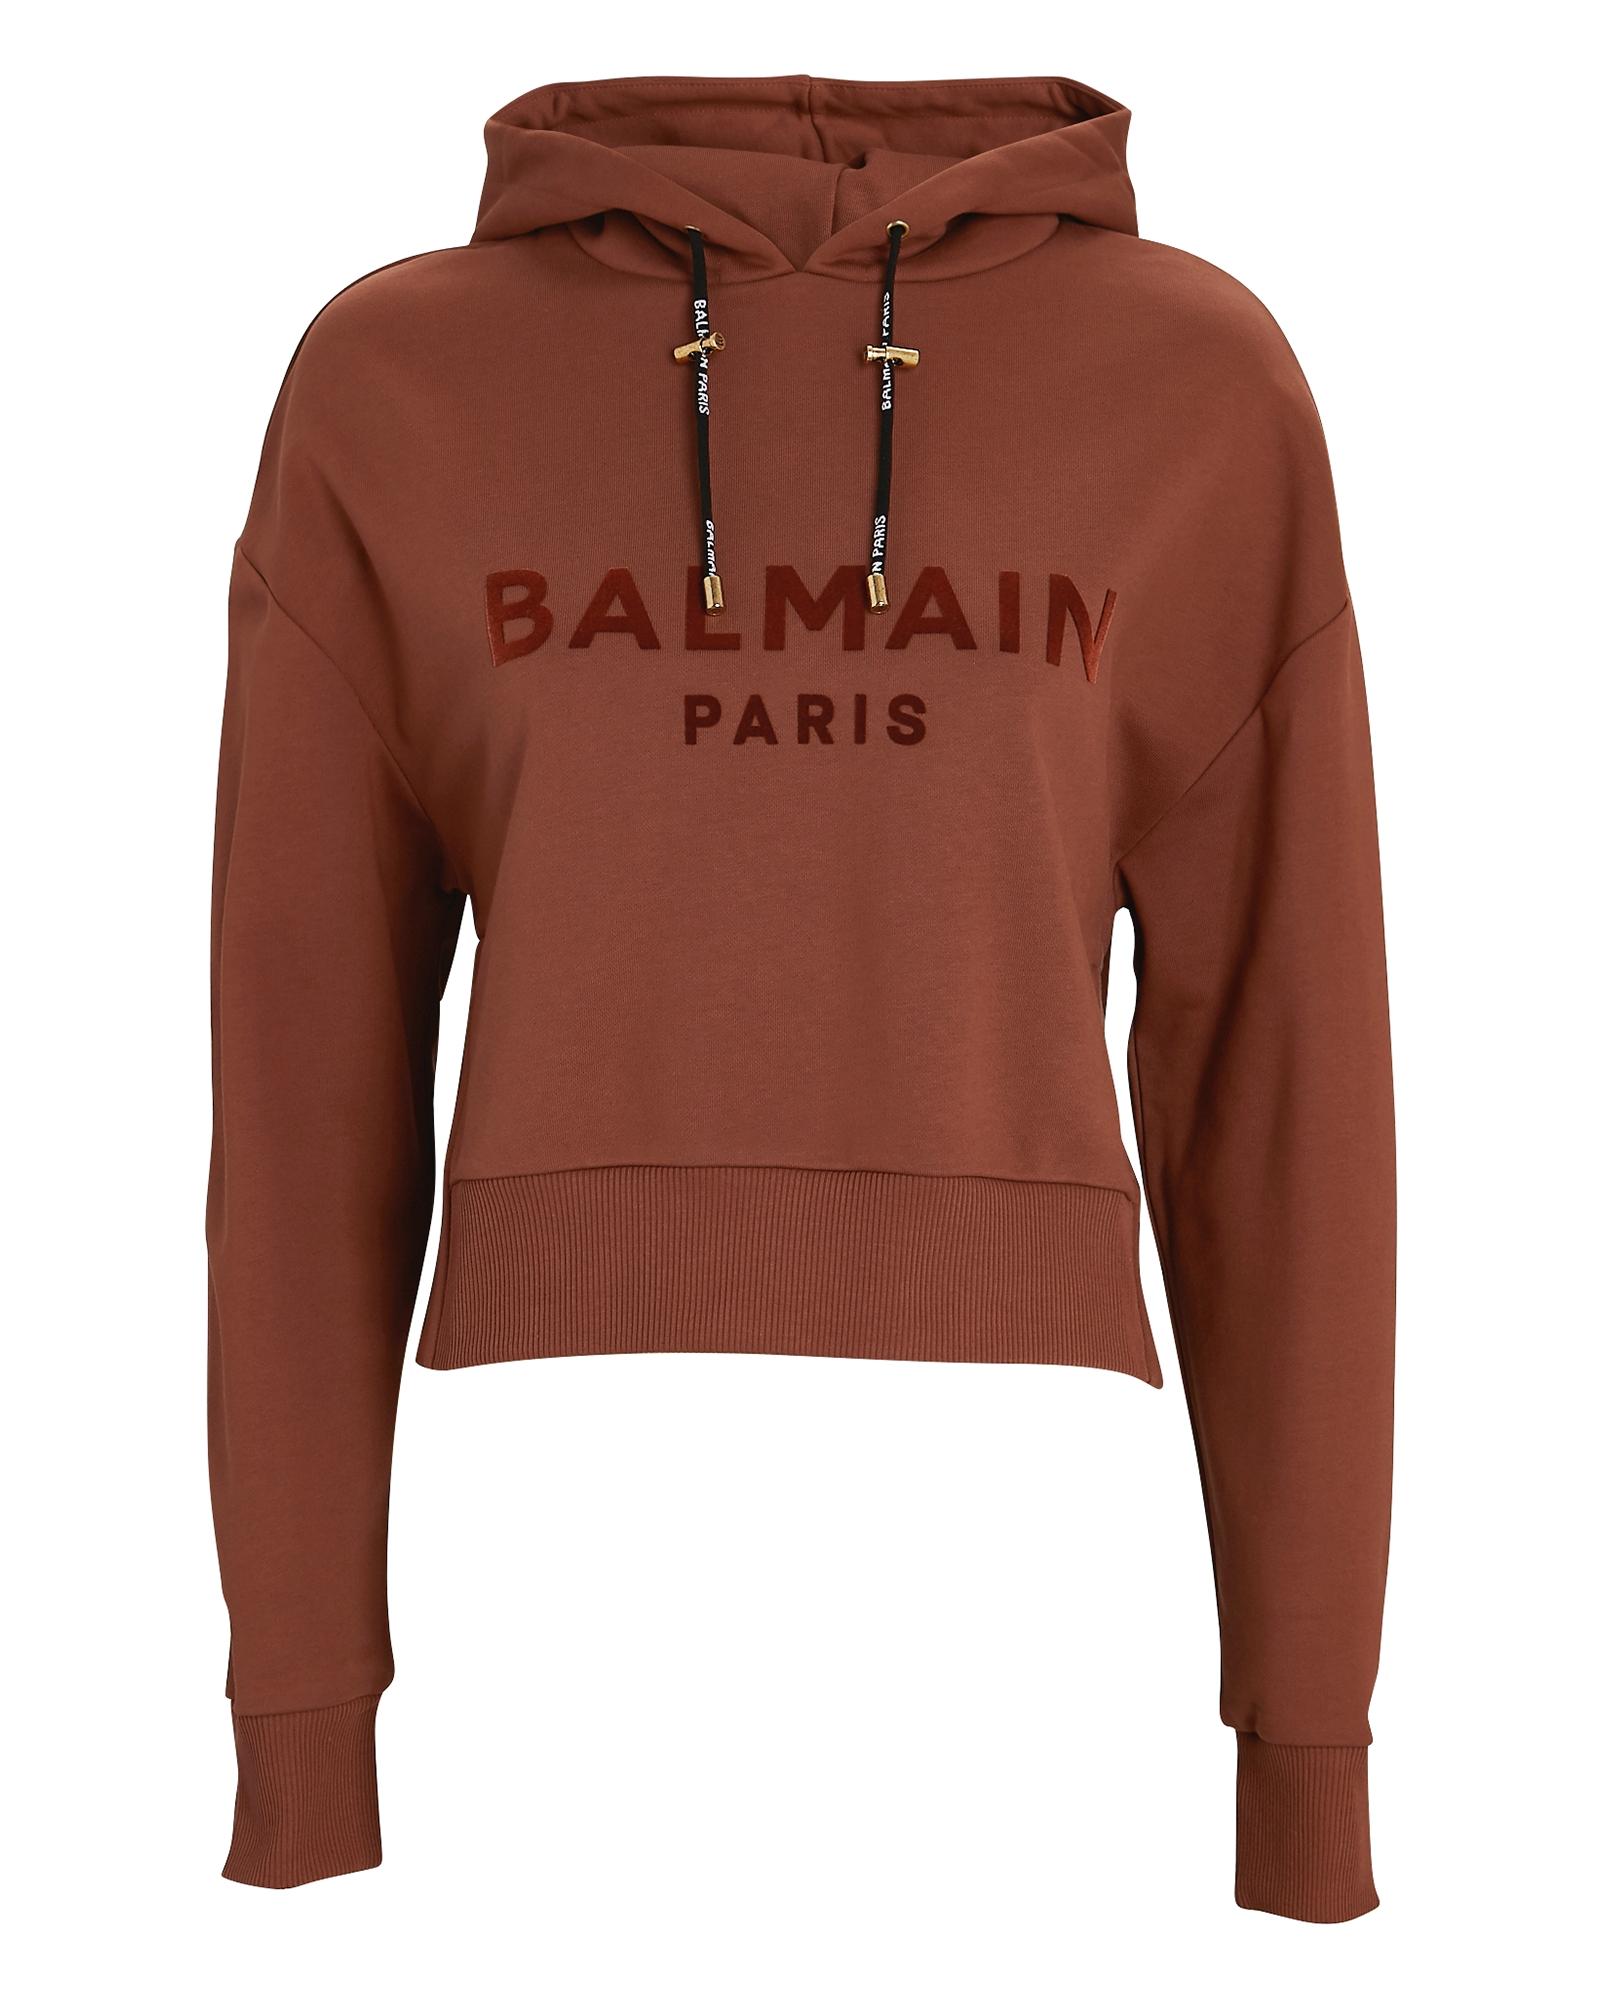 Balmain BALMAIN FLOCKED LOGO HOODED SWEATSHIRT